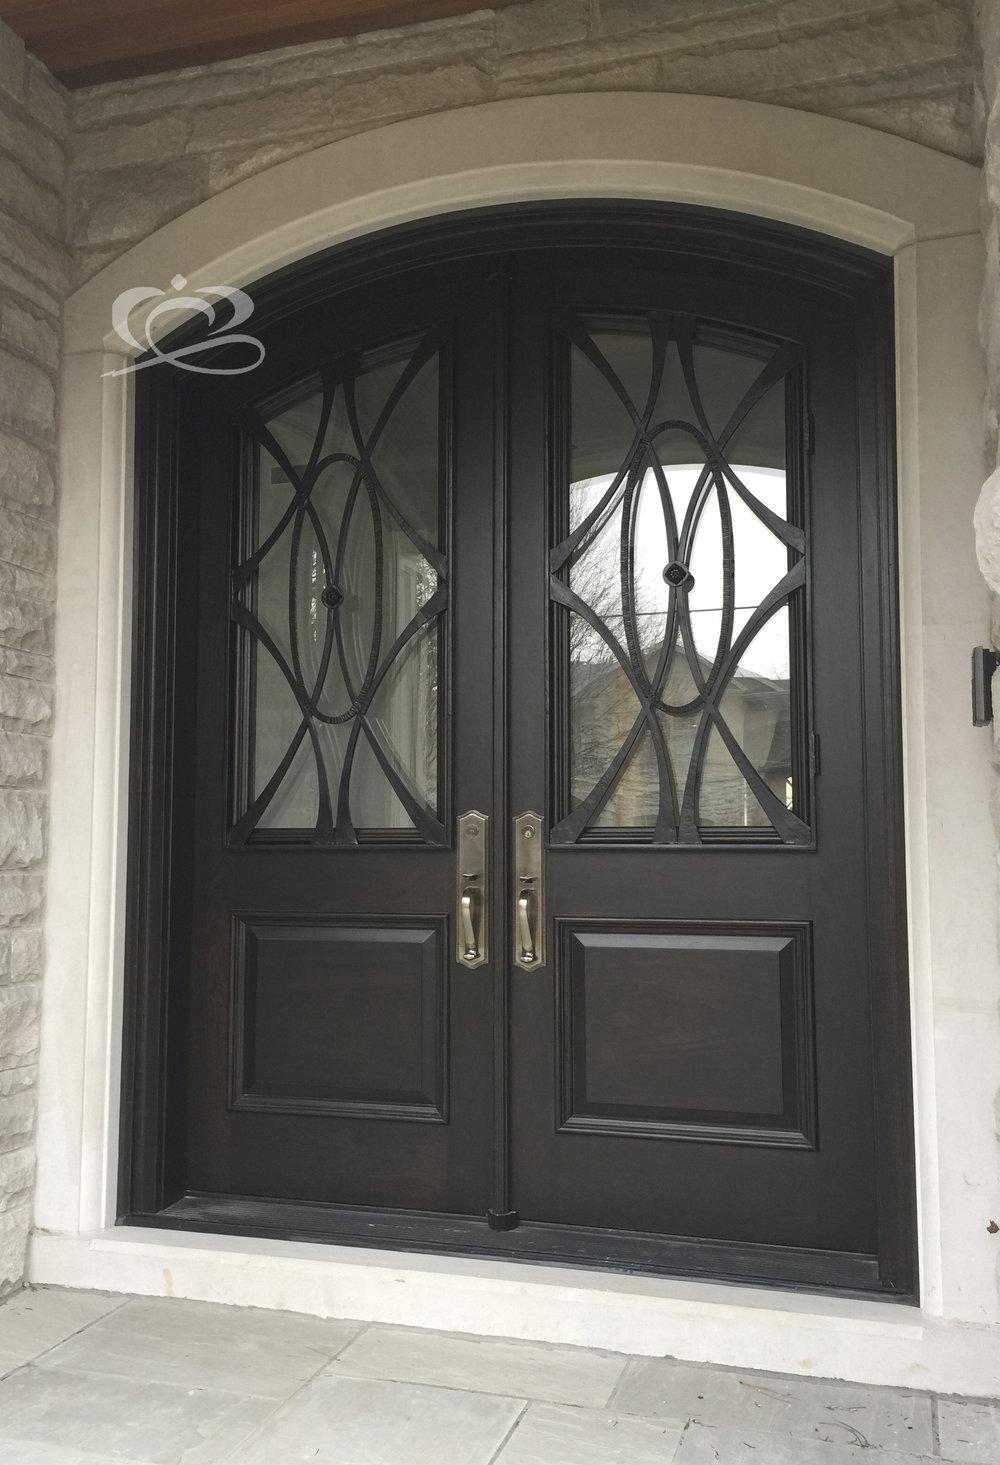 Double Grand Entrance Doors \u2014 Corona Architectural Windows \u0026 Doors Inc. & Double Grand Entrance Doors \u2014 Corona Architectural Windows \u0026 Doors ...